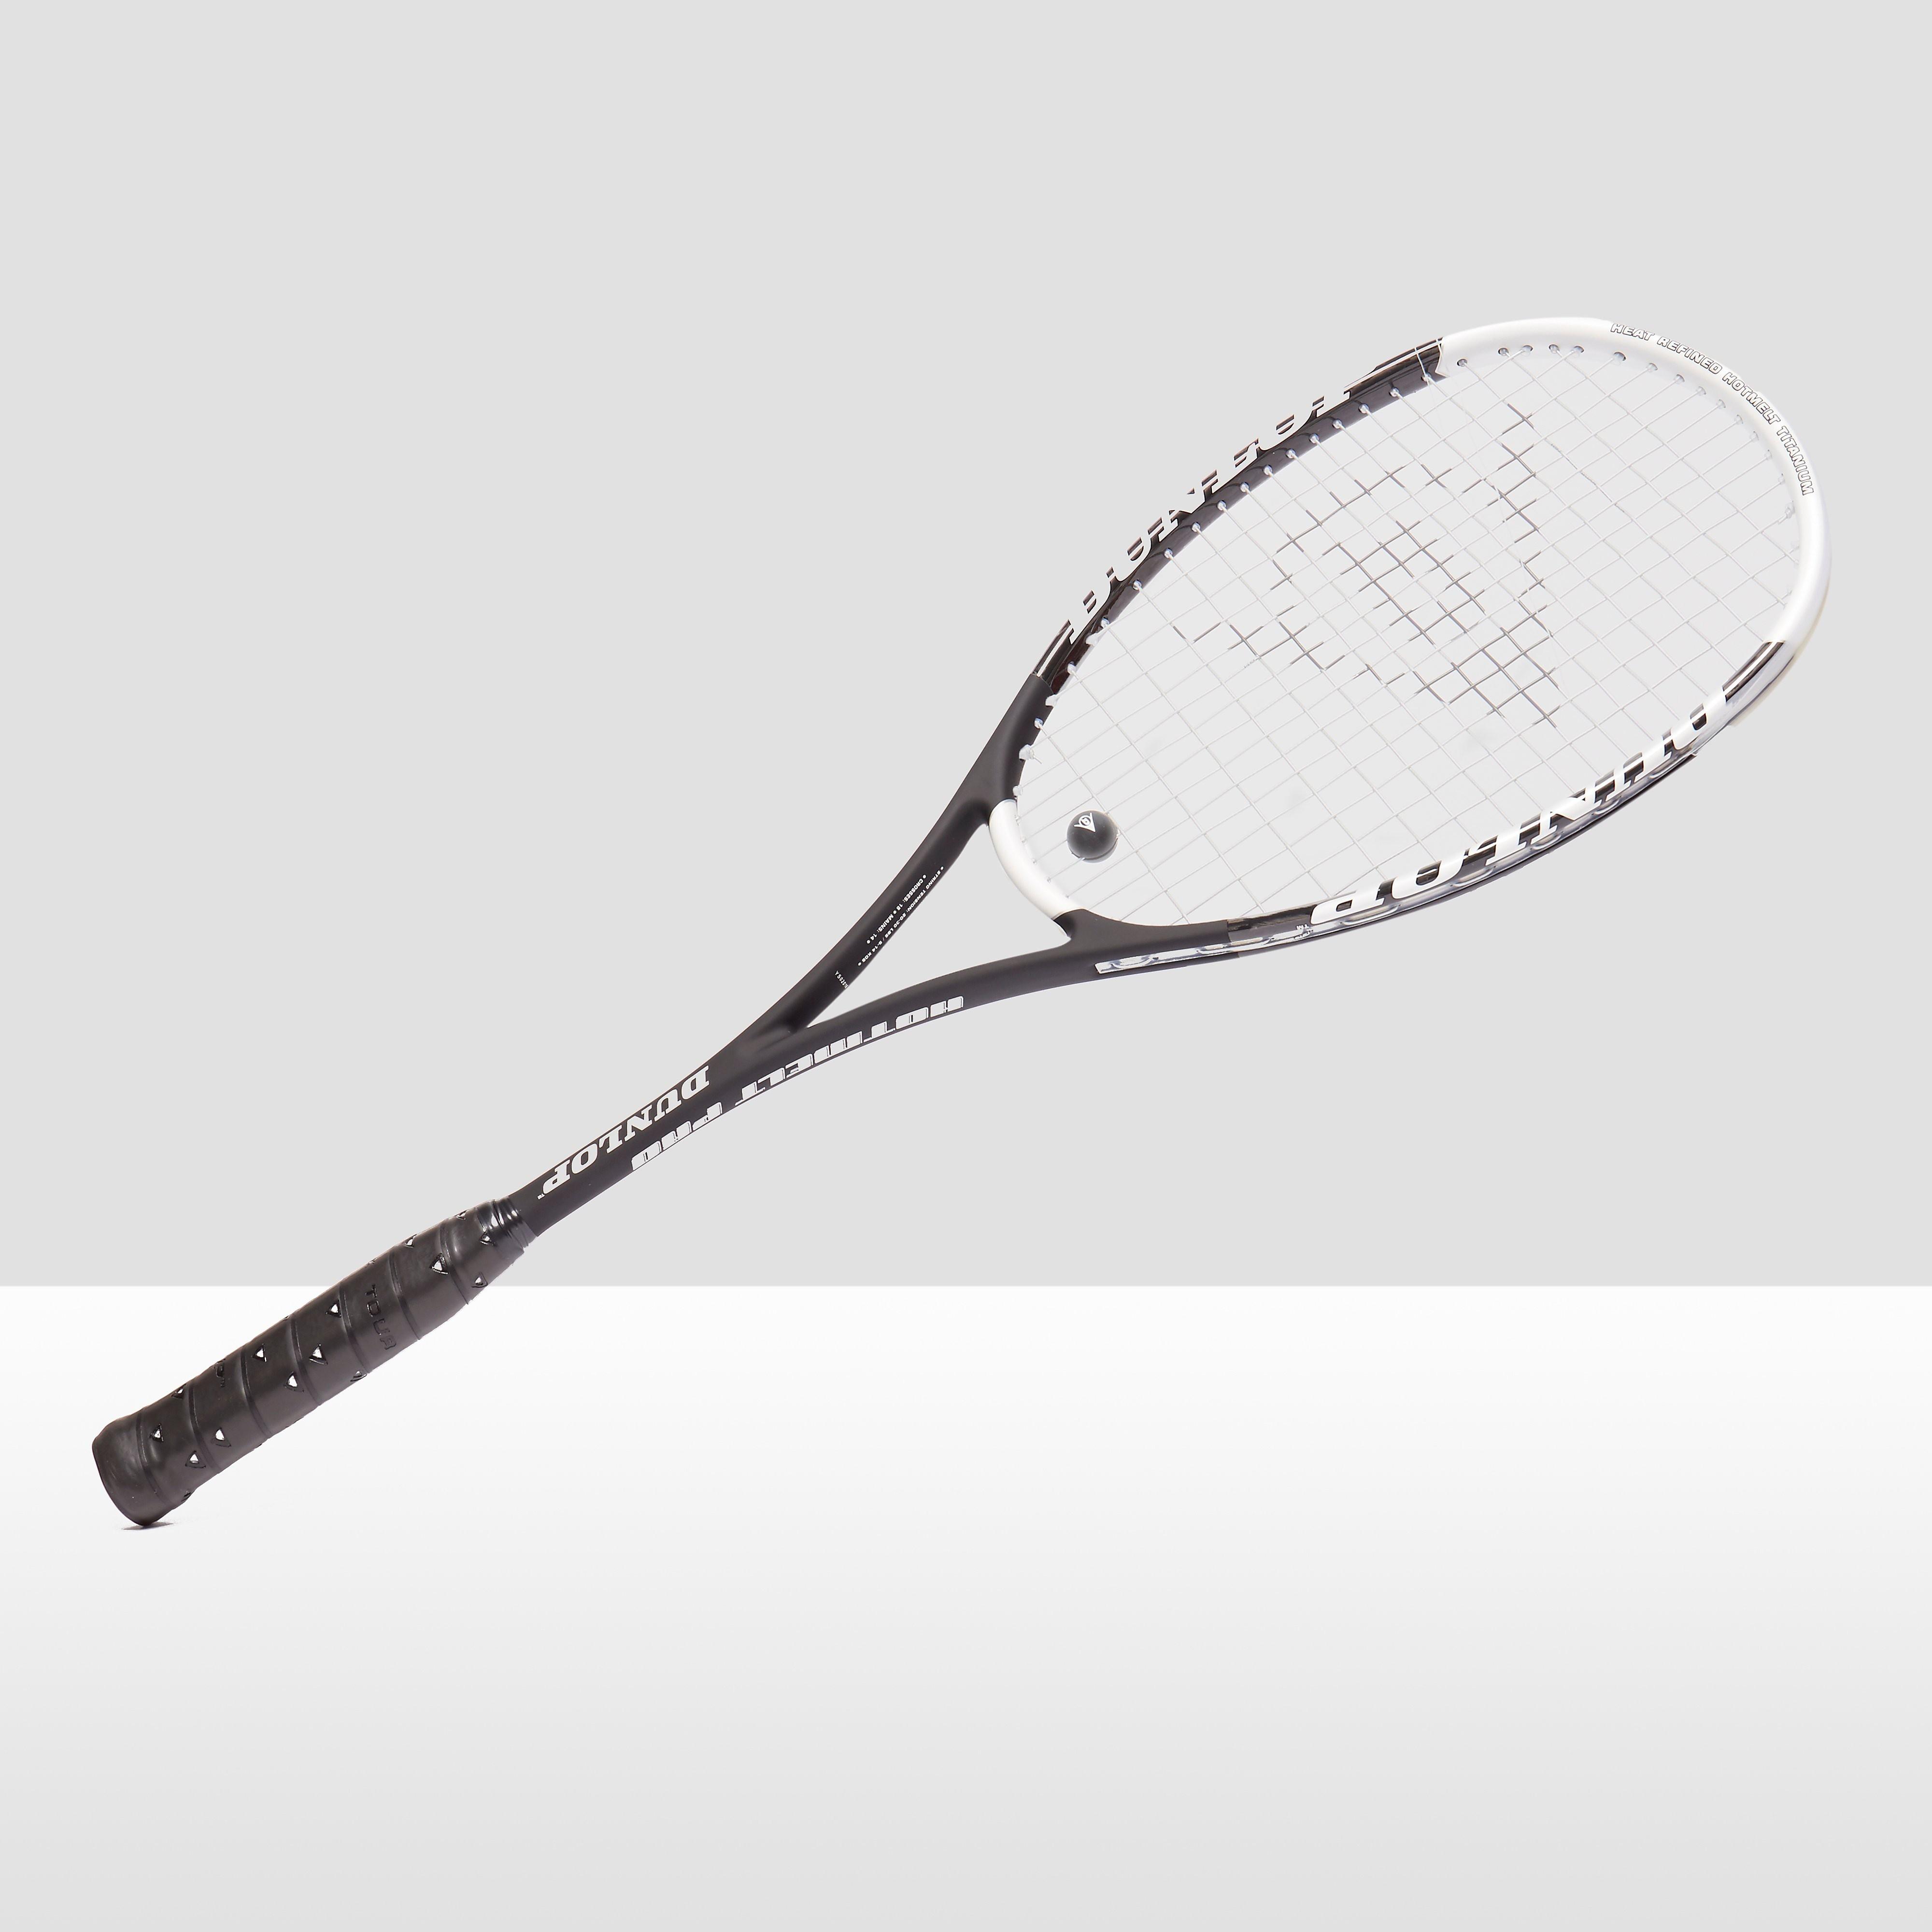 Dunlop Hotmelt Pro Squash Racket